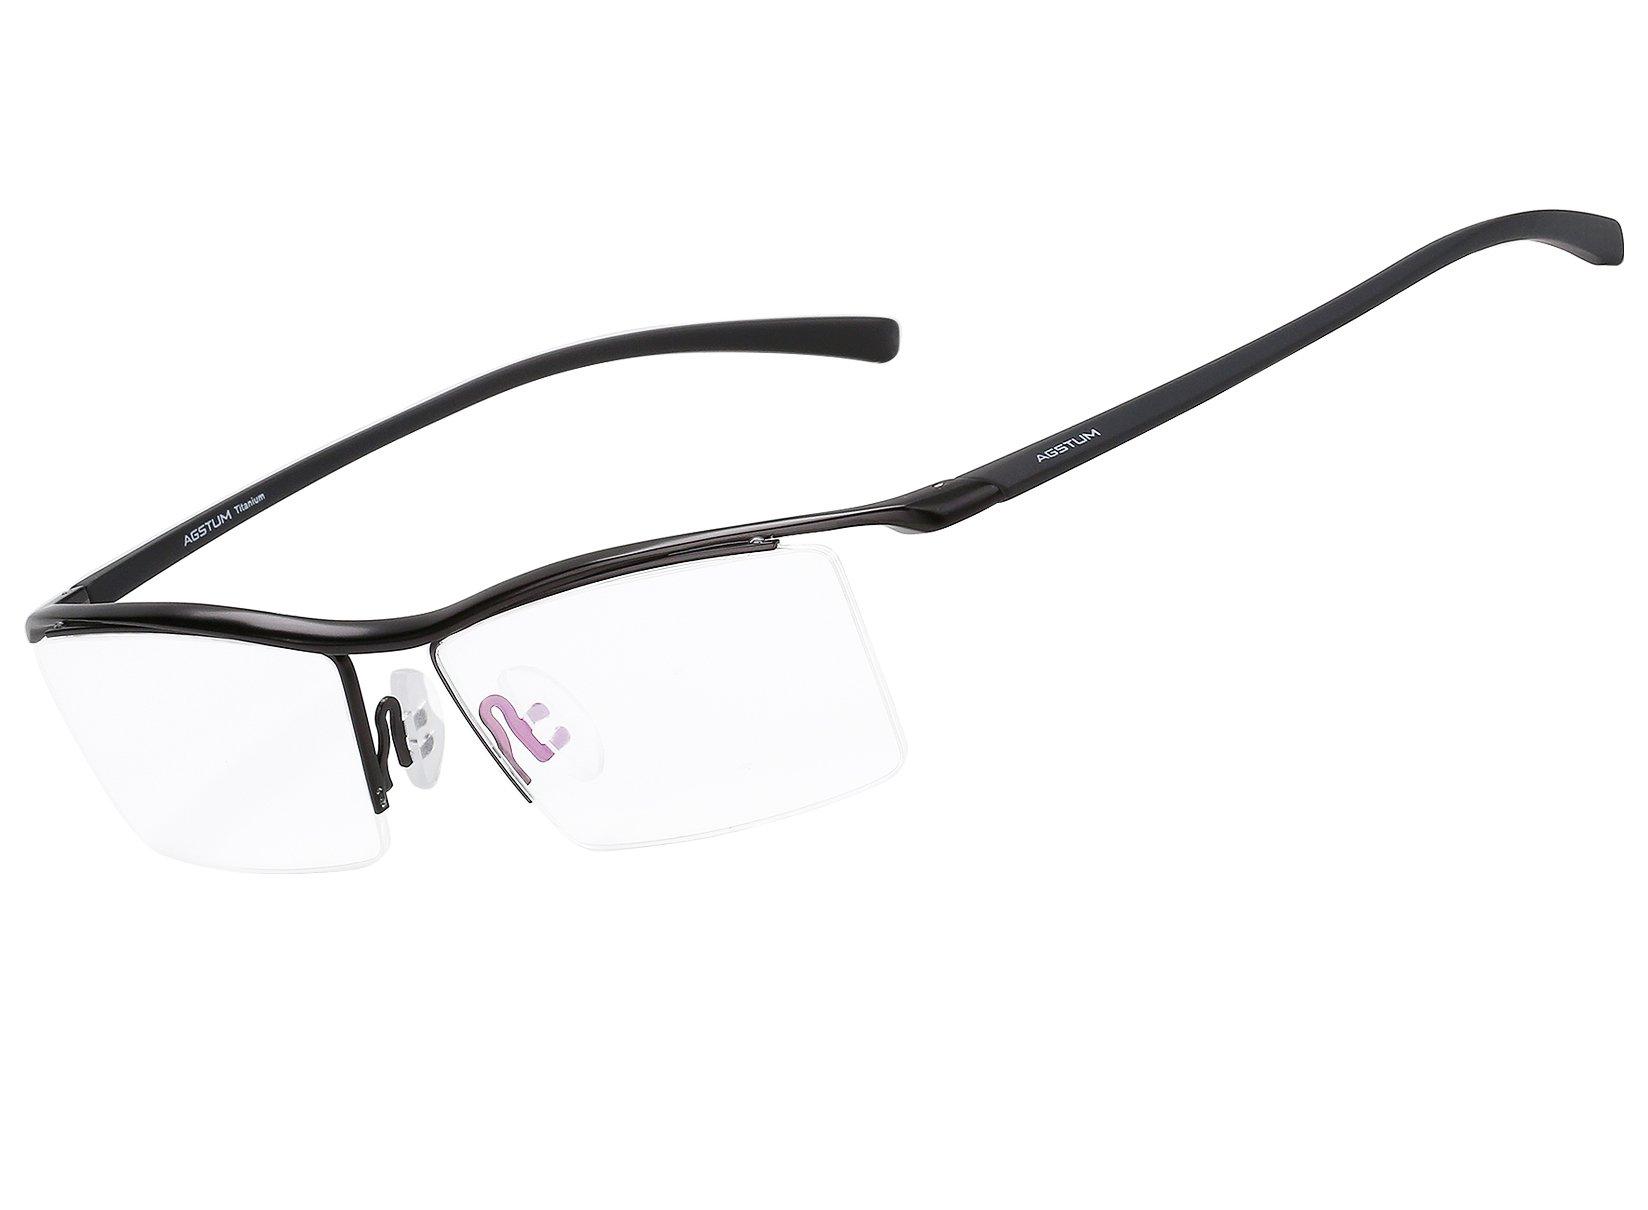 Agstum Pure Titanium Half Rimless Business Glasses Frame Optical Eyeglasses Clear Lens (Black) by Agstum